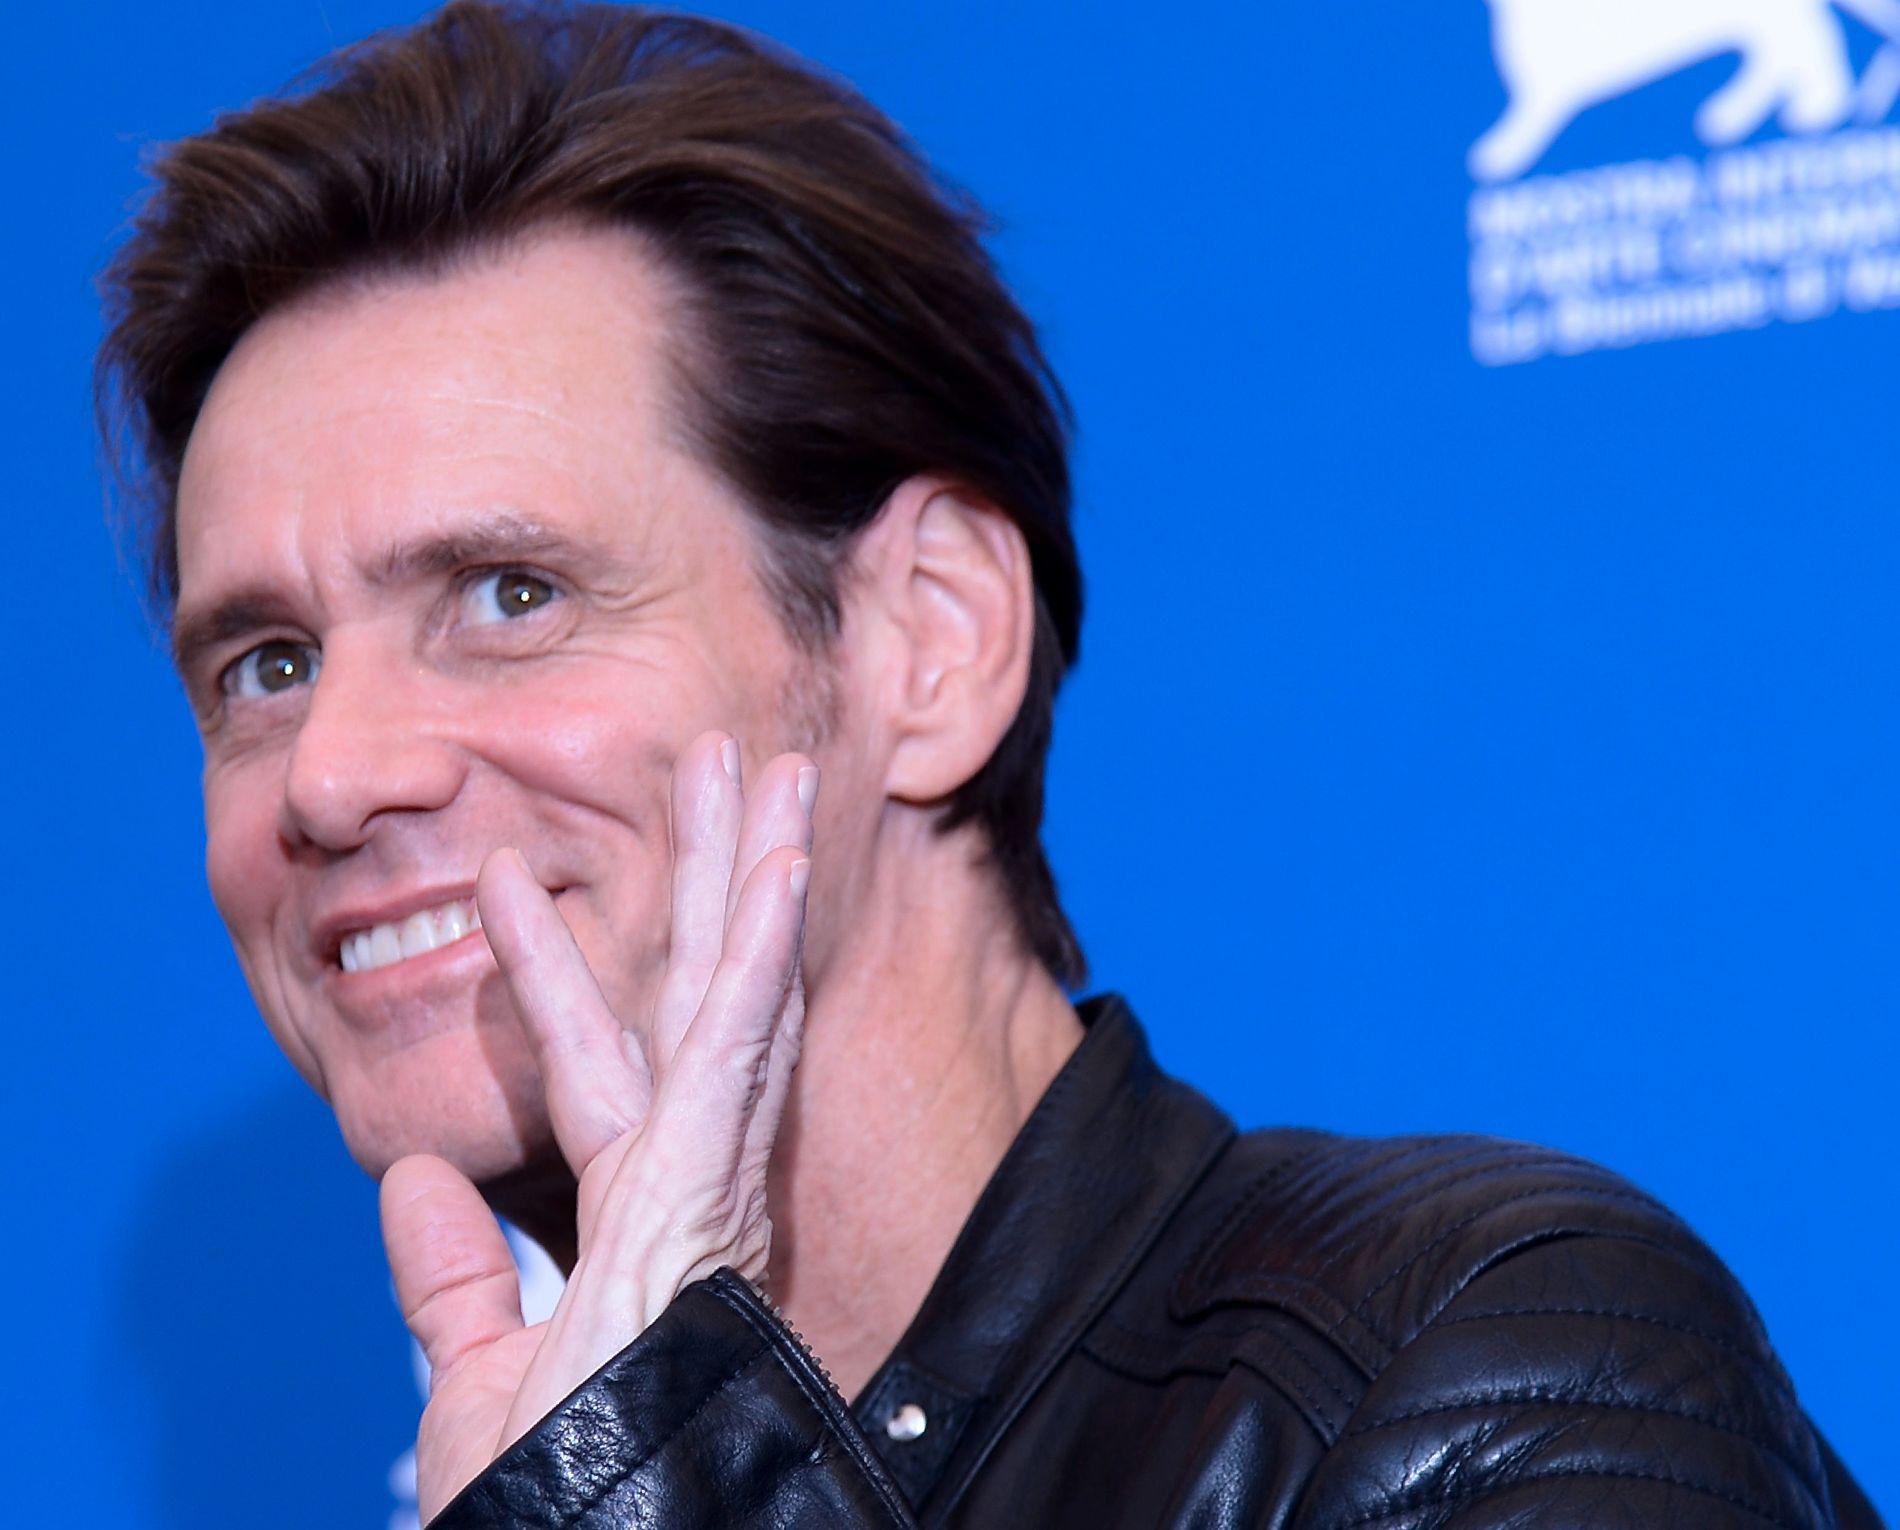 PROVOSERER: Jim Carrey, her på Filmfestivalen i Venezia i fjor, er kunstnerprovokatør på si.